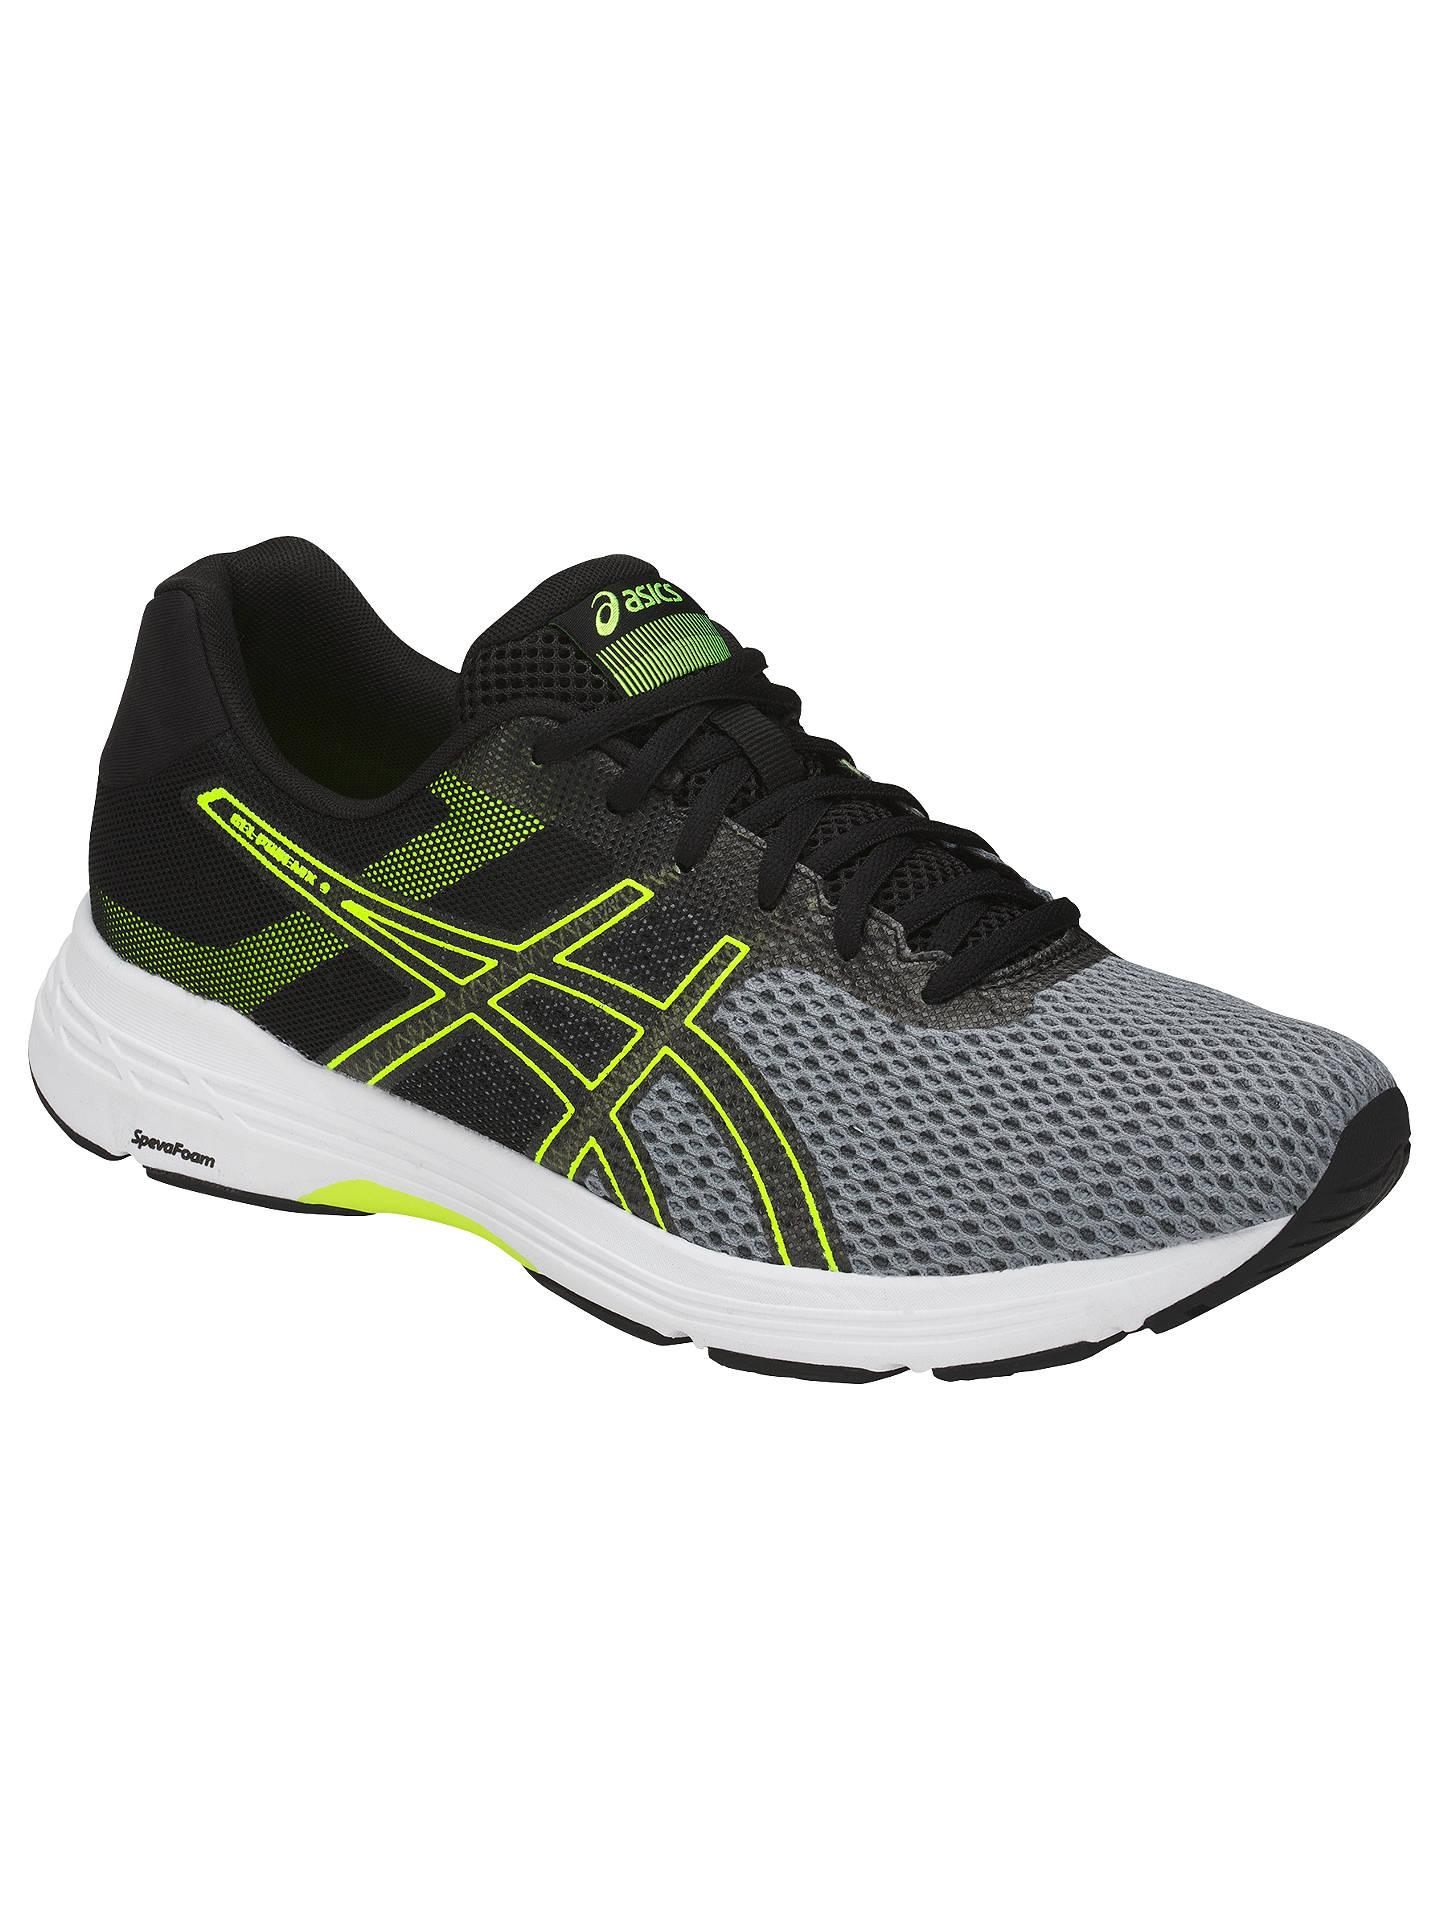 Asics GEL PHOENIX 9 Men's Running Shoes at John Lewis & Partners